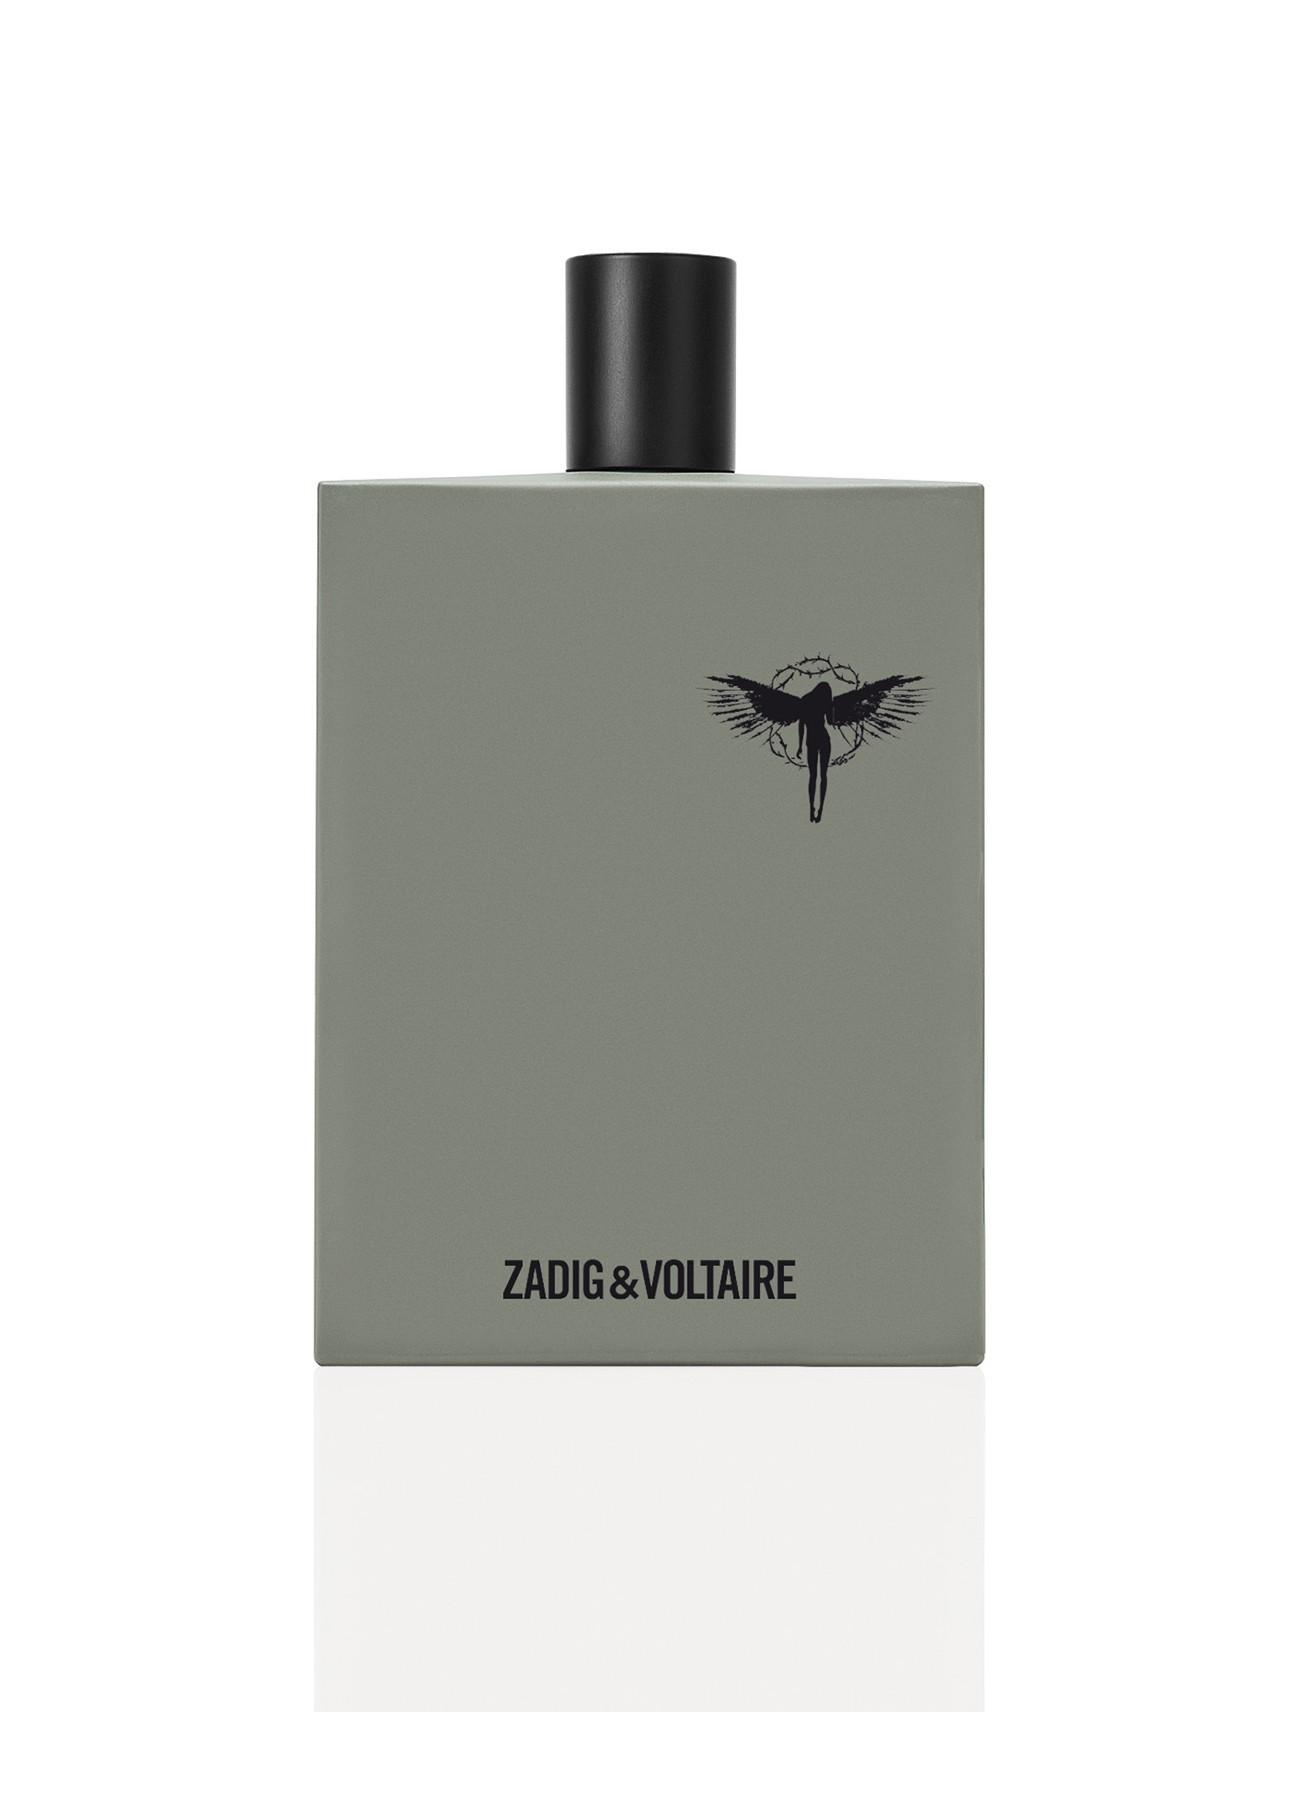 Zadig & Voltaire Tome 1 : La Pureté for Him аромат для мужчин